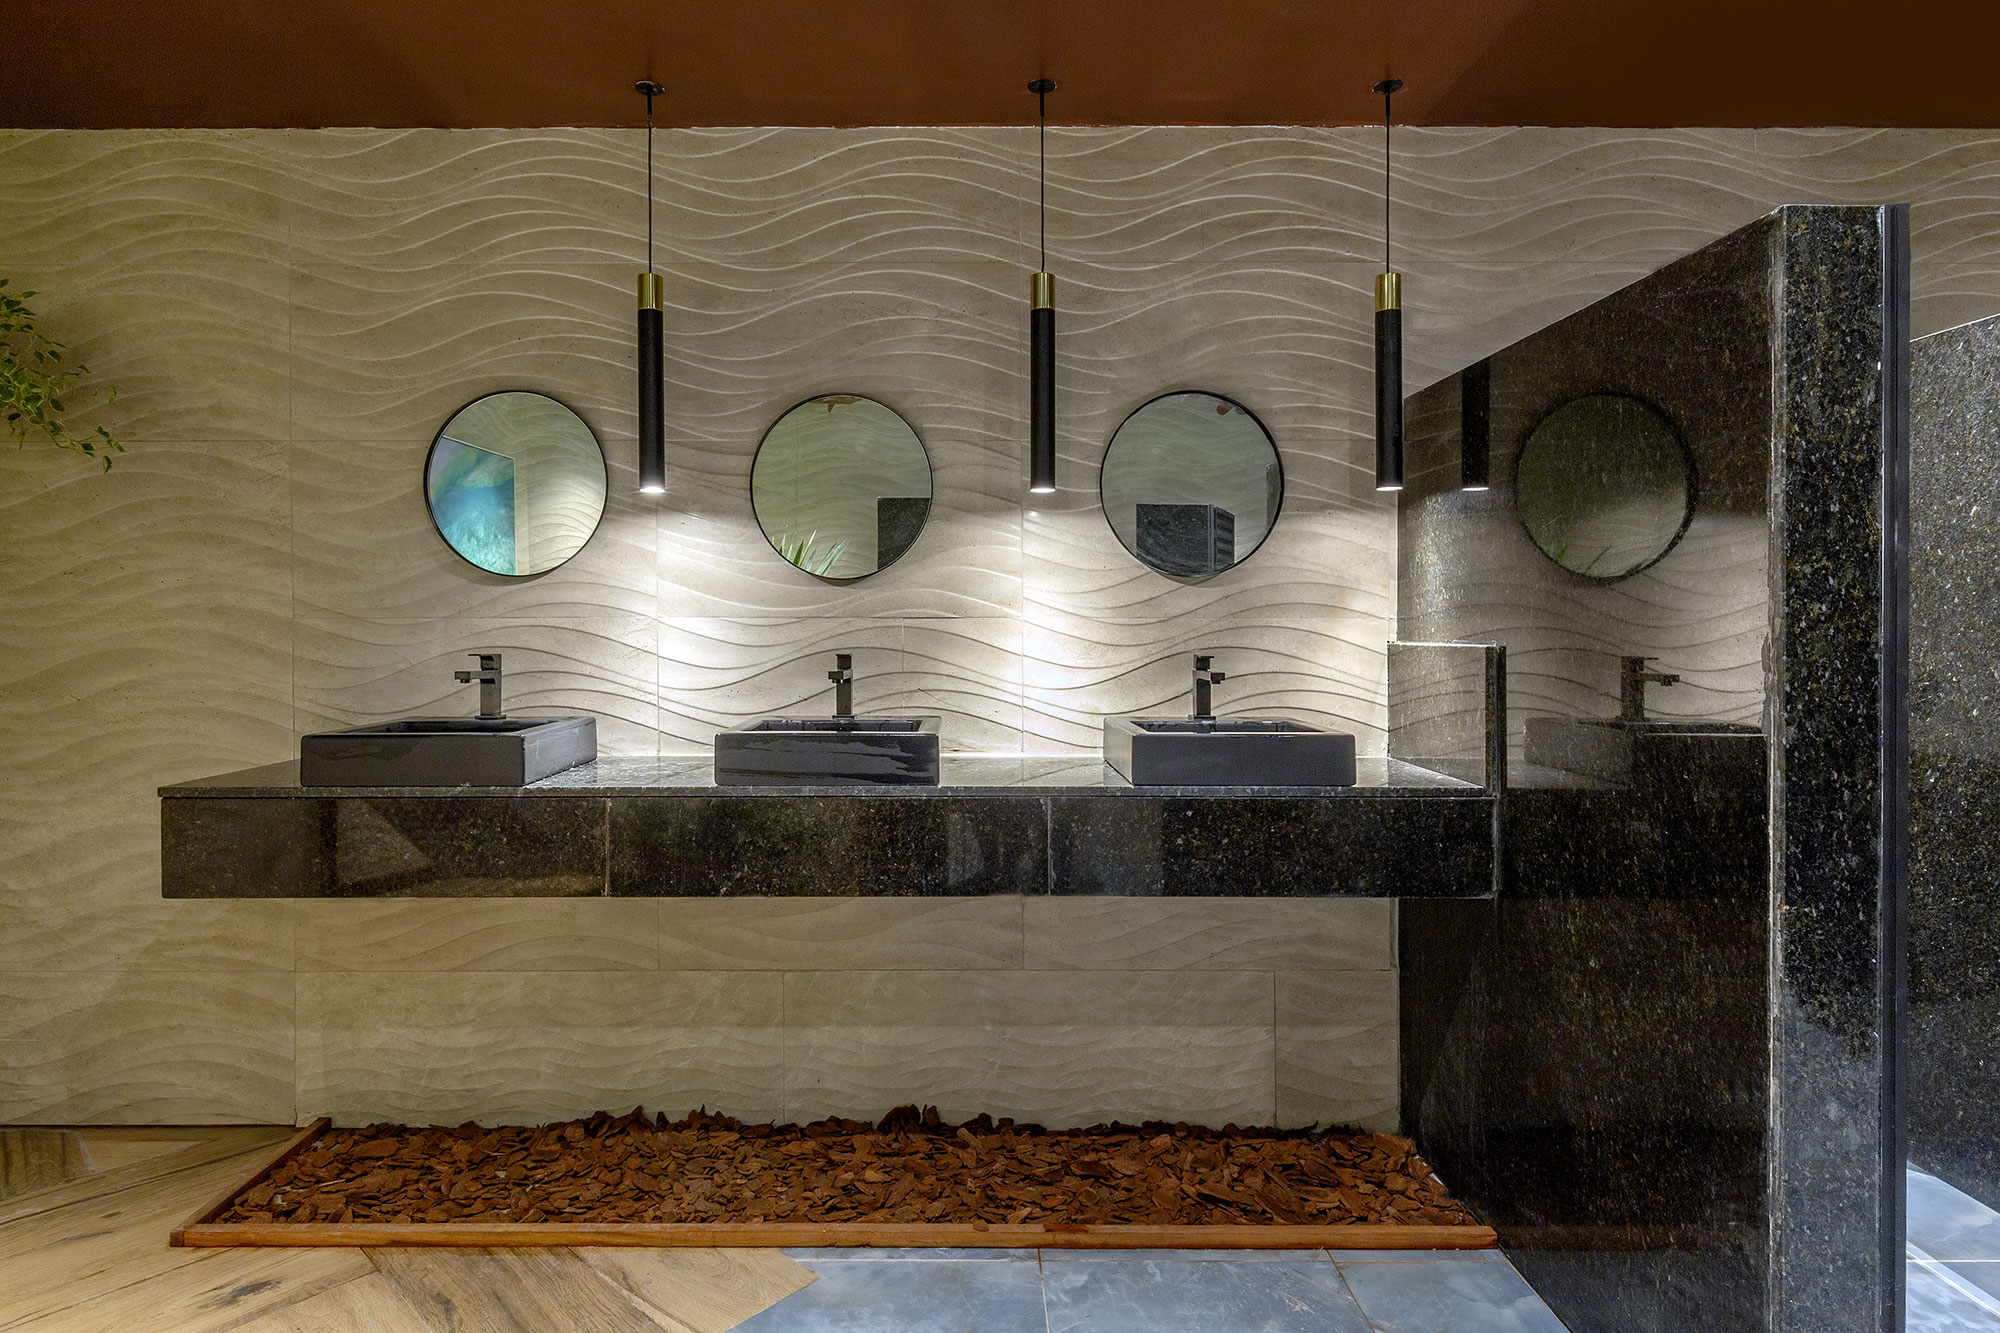 Bauen-Arquitetura-Banheiro-Publico-Masculino-Janelas-Casacor-Tocantins-Foto-Edgar-Cesar